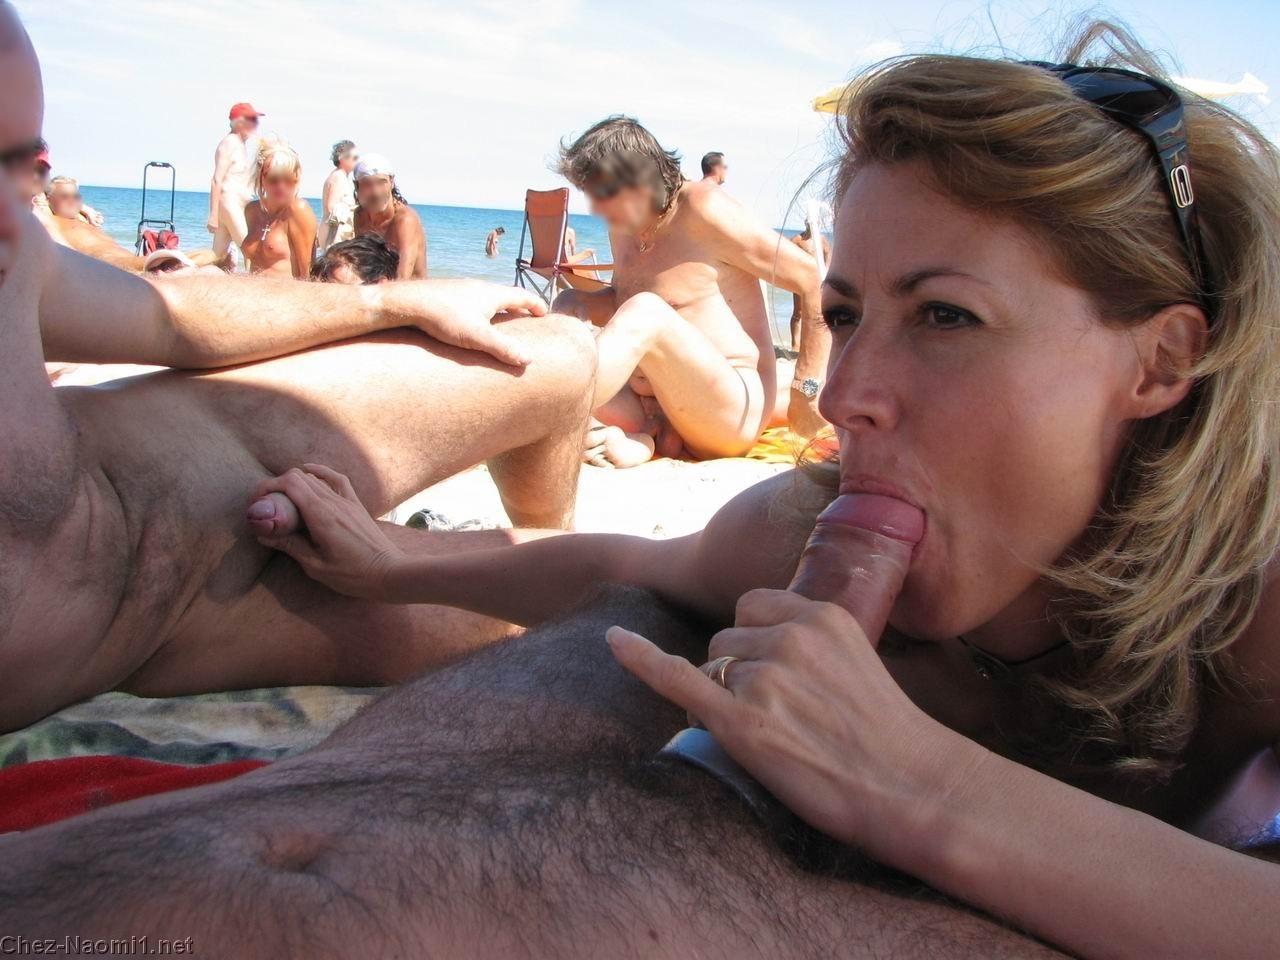 Naked girls having sex at the beach Beach Sex Hidden Cameras Naked Girls And Men